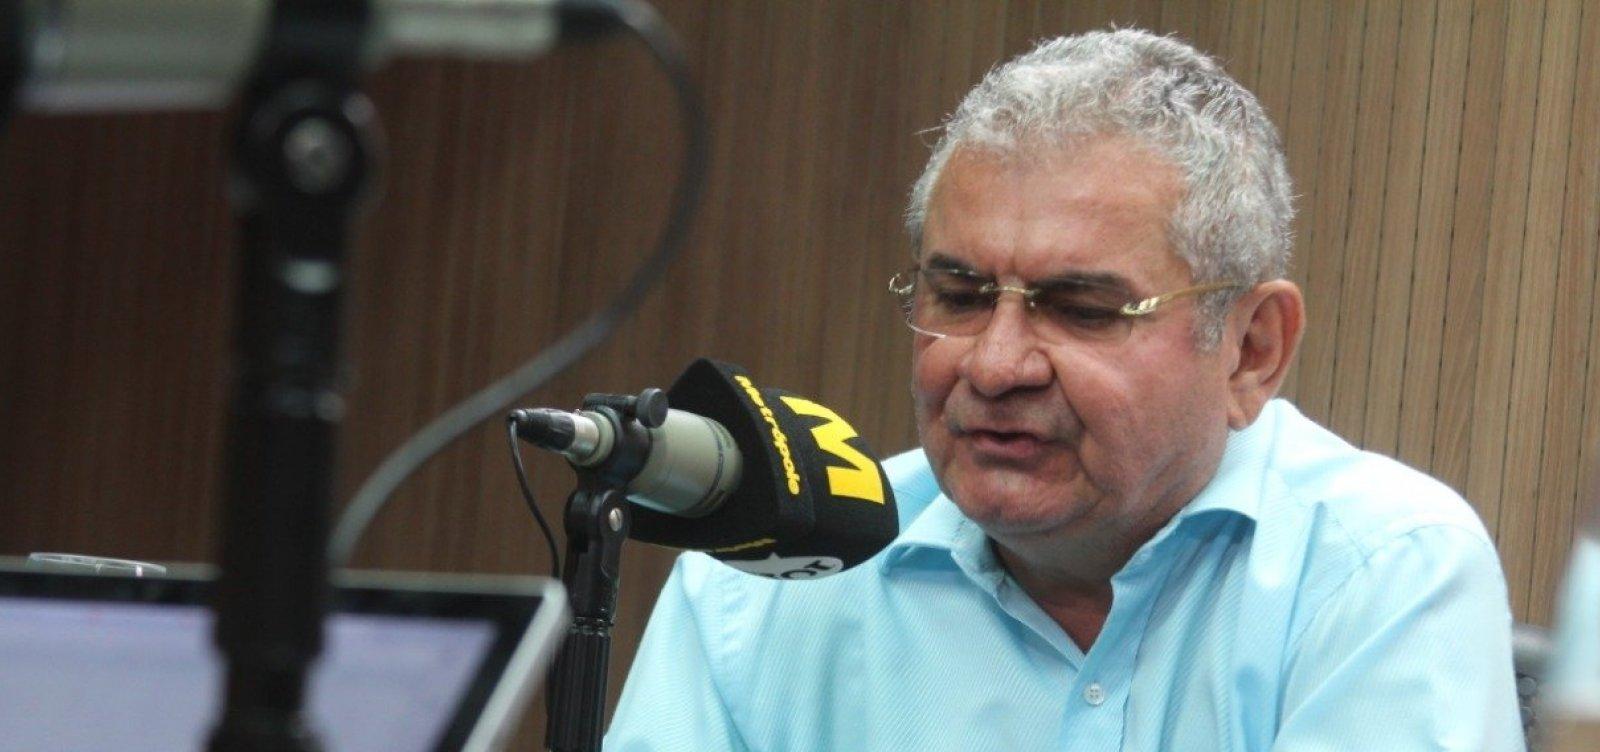 [Coronel critica Bolsonaro e ironiza Marcelo Nilo: '[Ganhei] sem os votos dele']